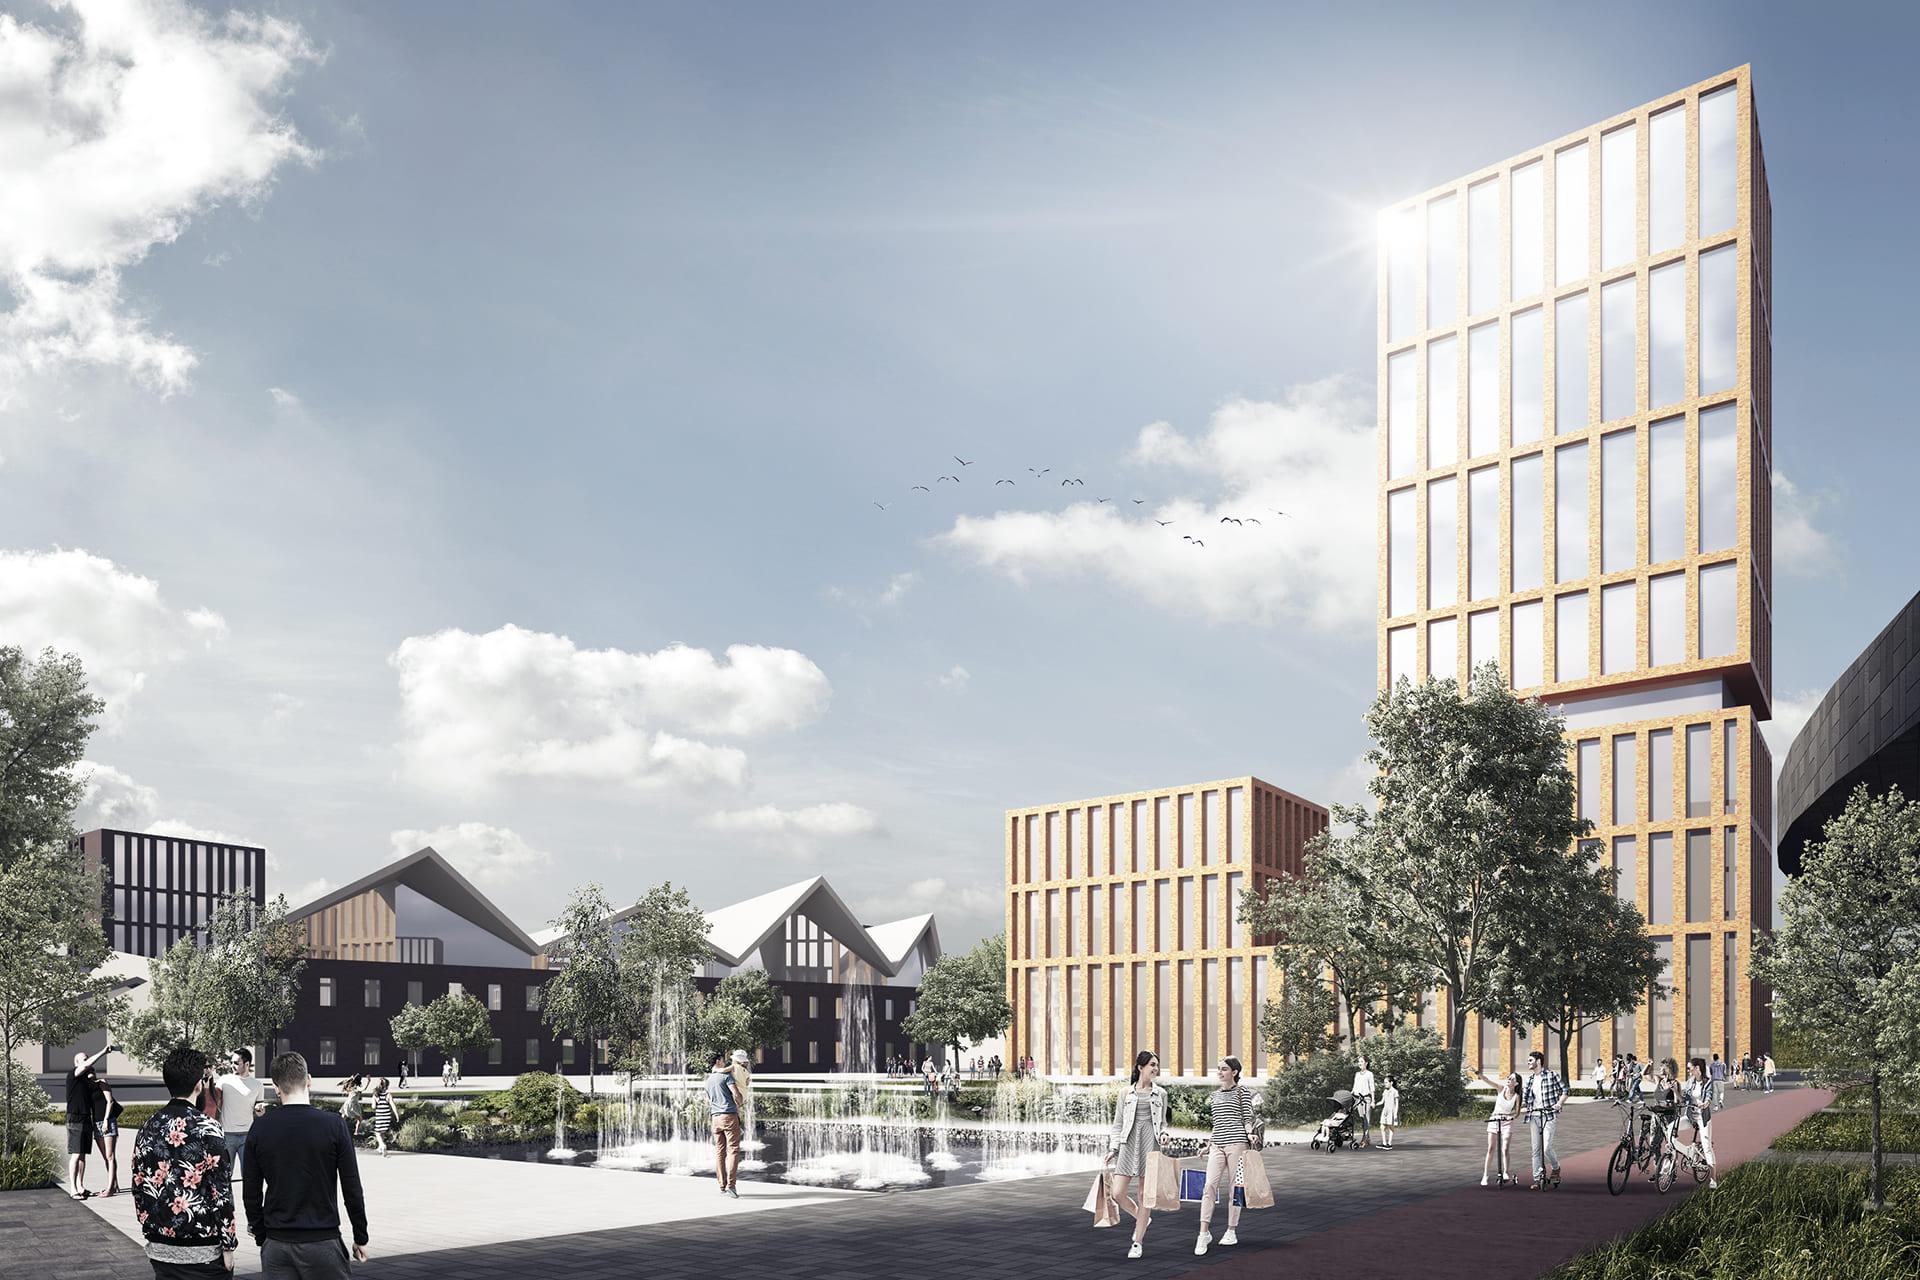 BREST LIVING DISTRICT <br/> Urban planning design competition